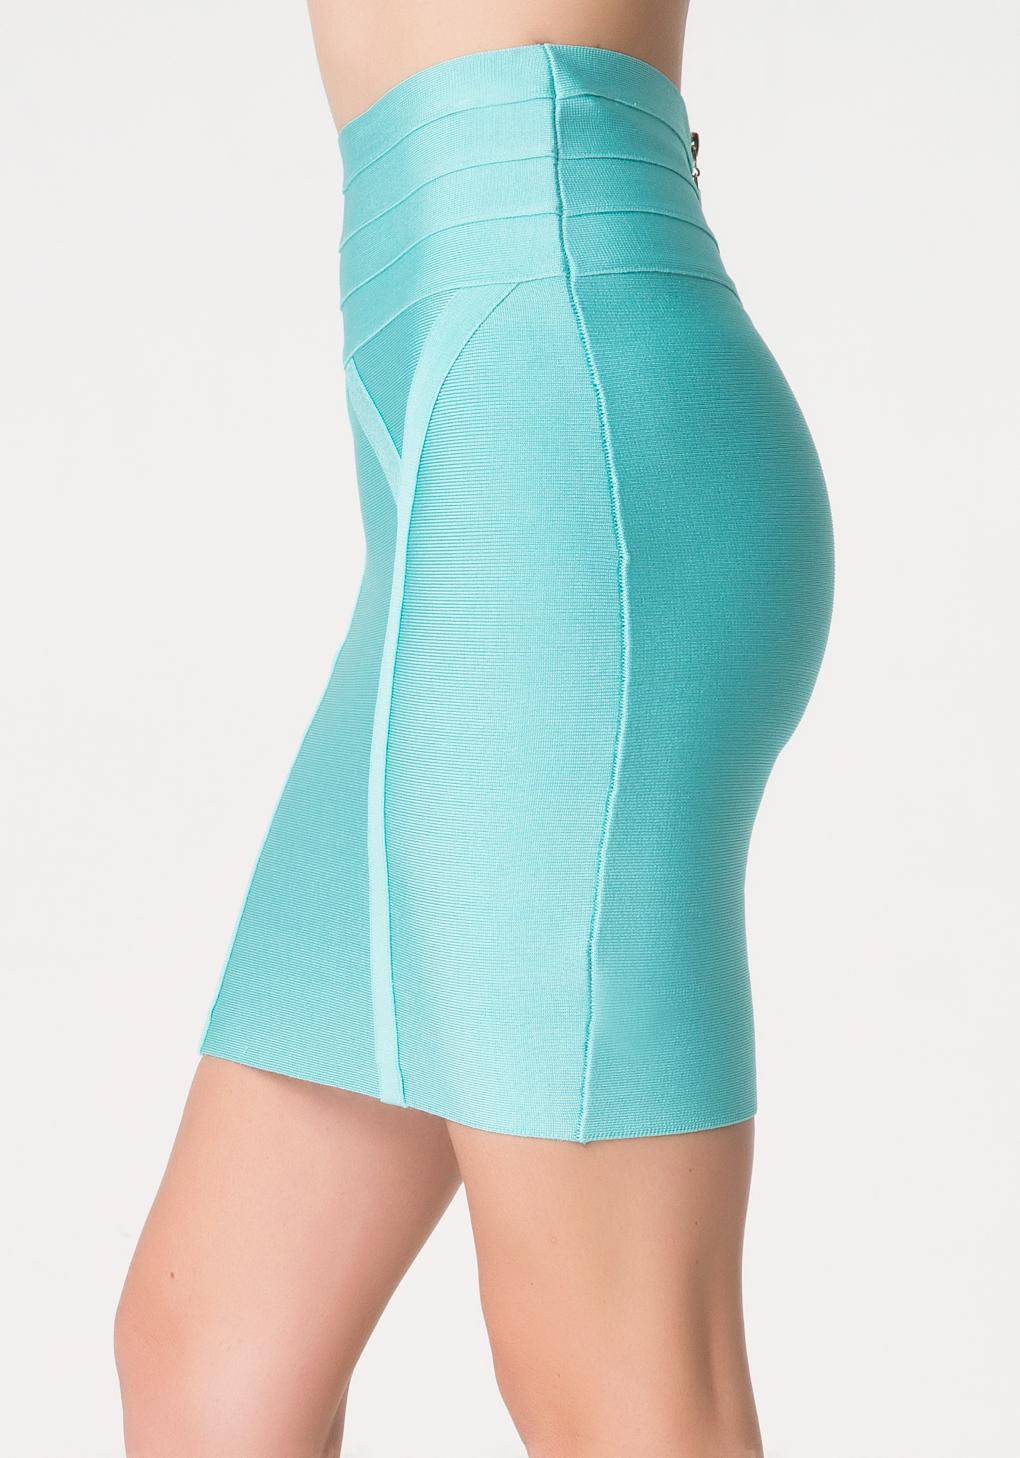 Bebe High Waist Bodycon Skirt in Blue | Lyst